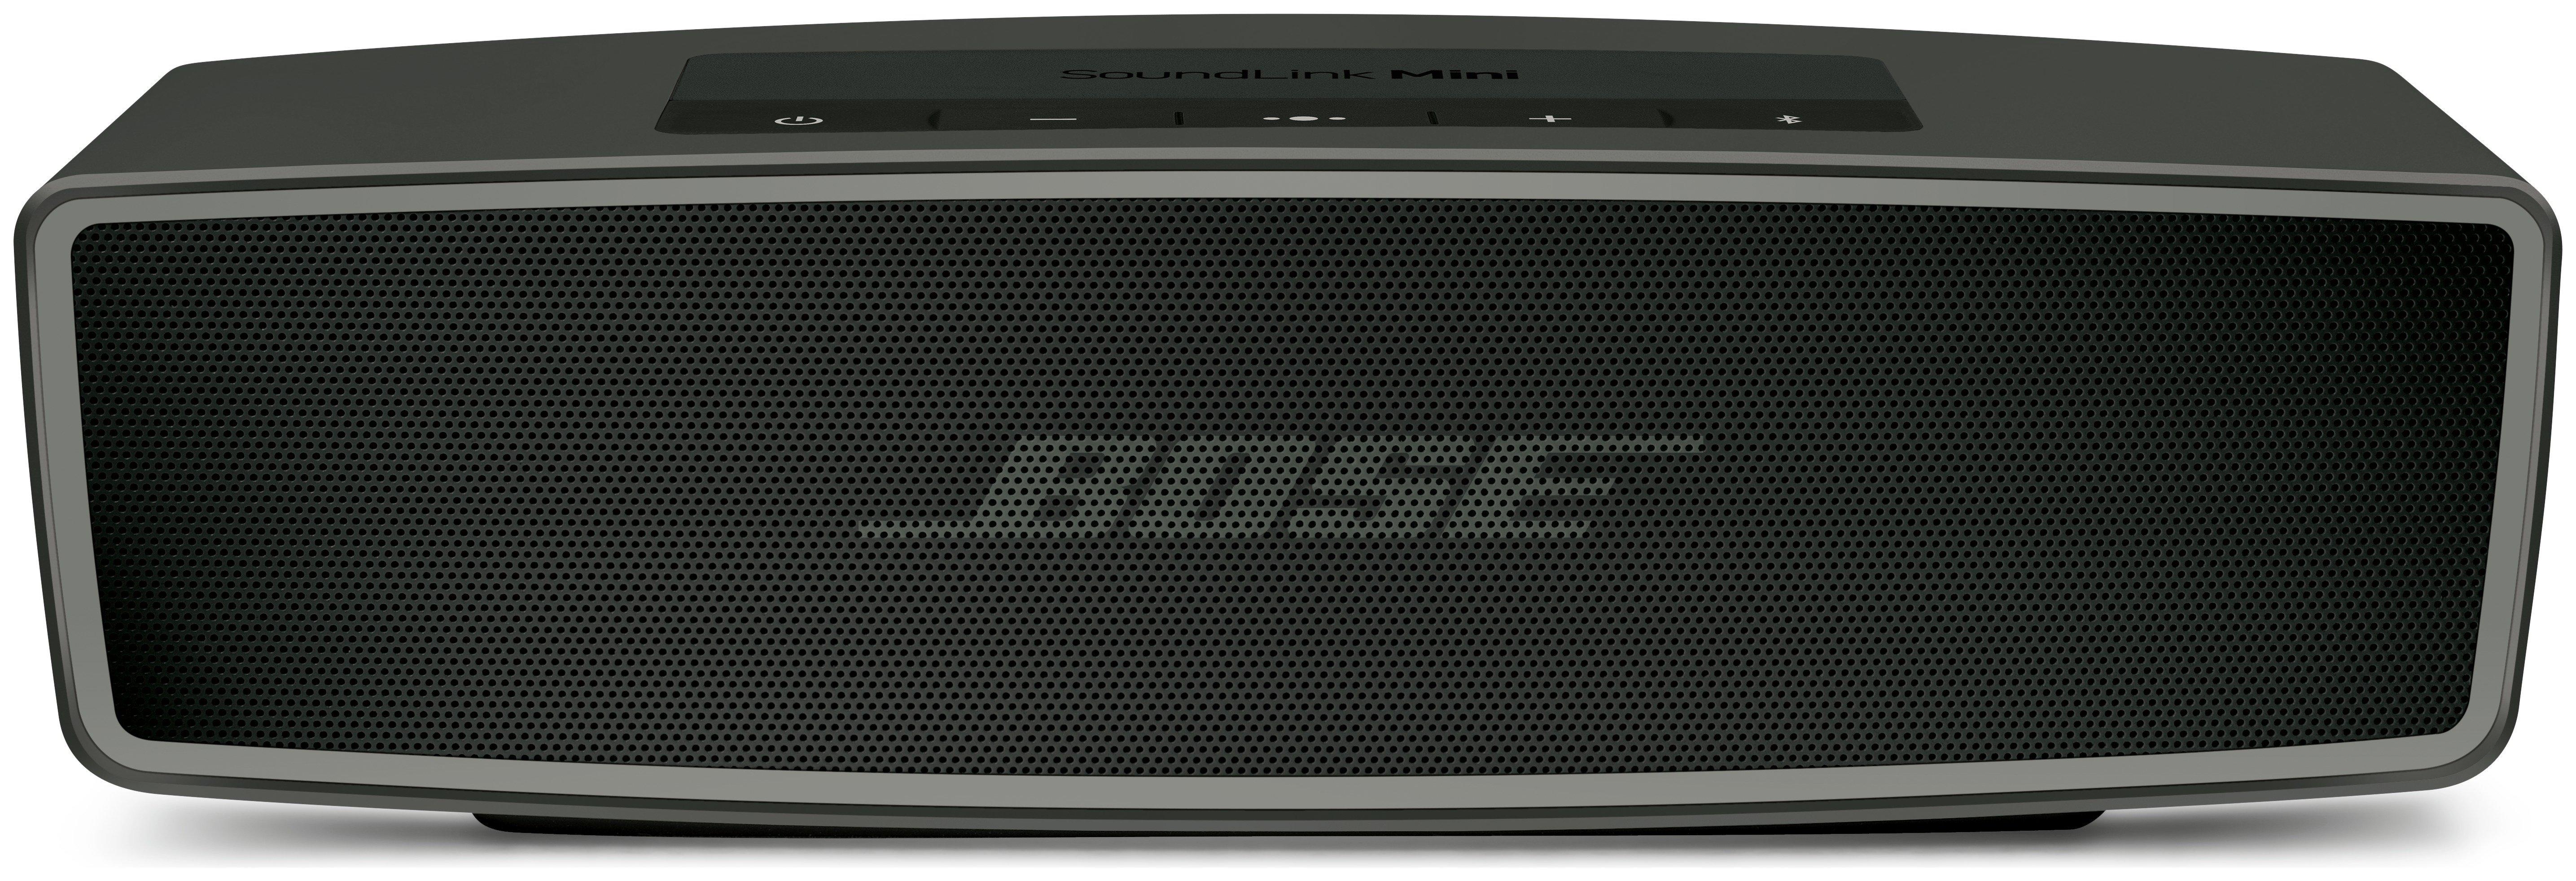 219.00 What A Deal! Buy SONOS PLAY:3 Wireless Multi-Room Speaker ...